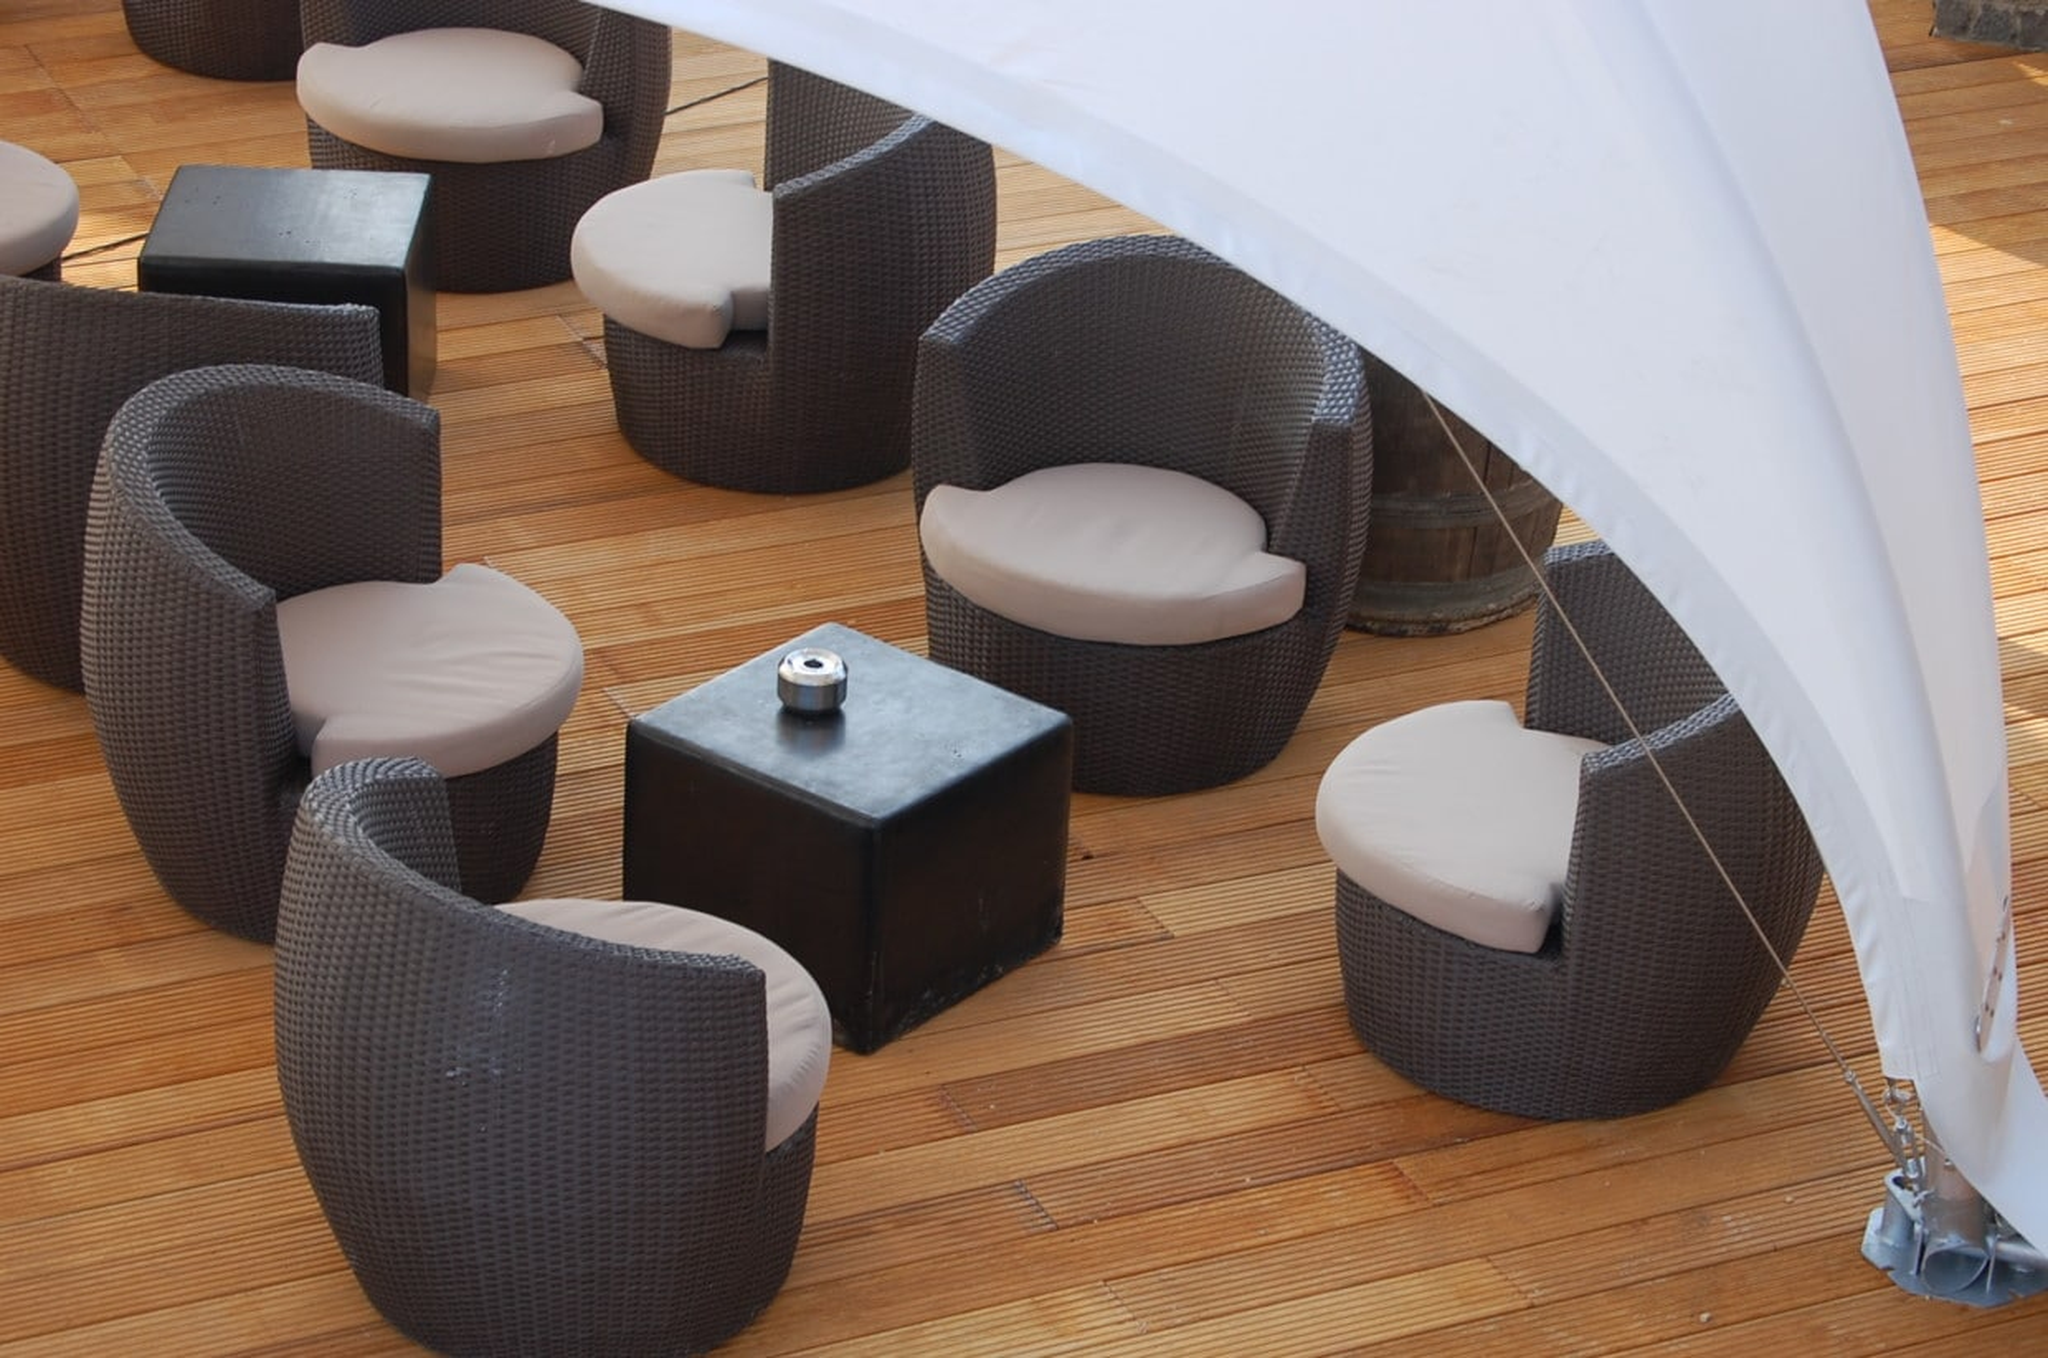 vip-pavillon Holzboden und Mobiliar